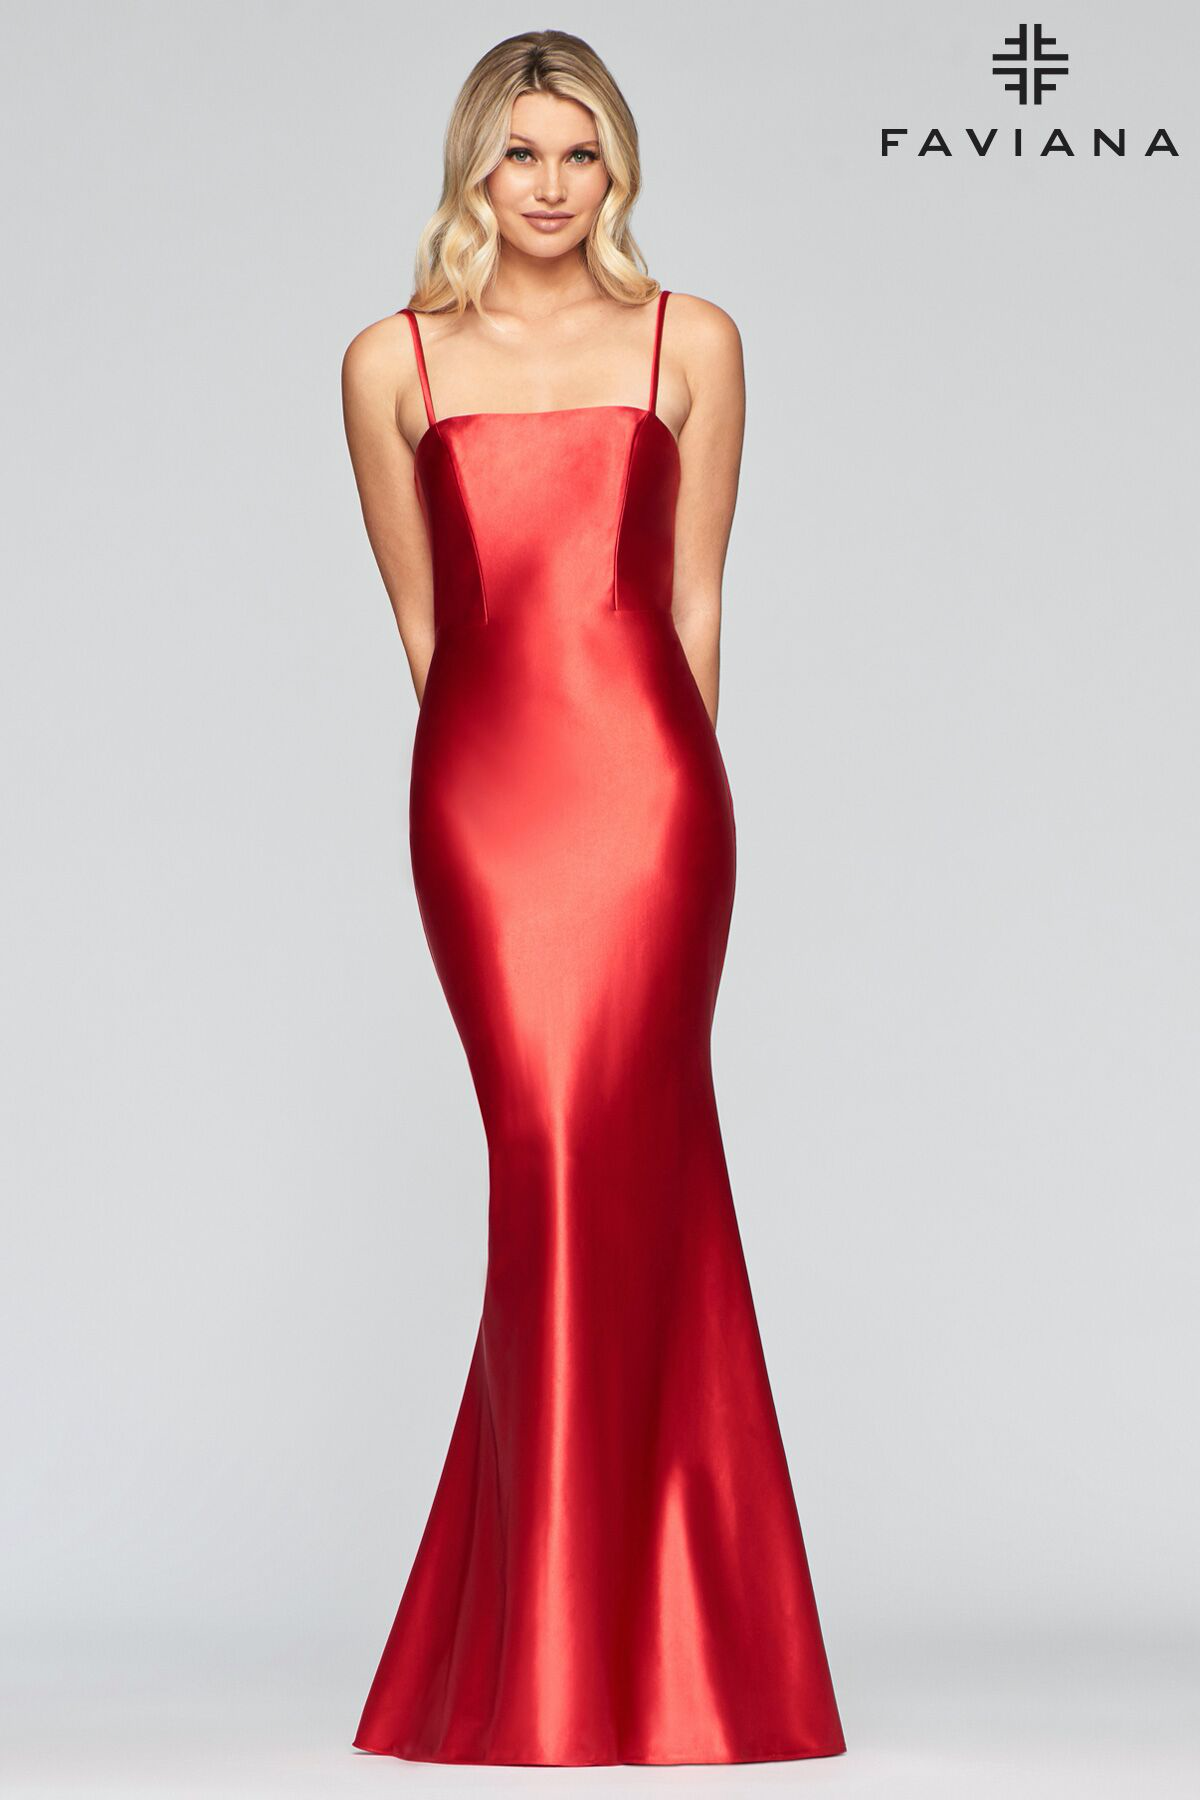 Faviana S10411 Satin Dress Long Black Long Sleeve Cocktail Dress Stretch Satin Dress [ 1800 x 1200 Pixel ]